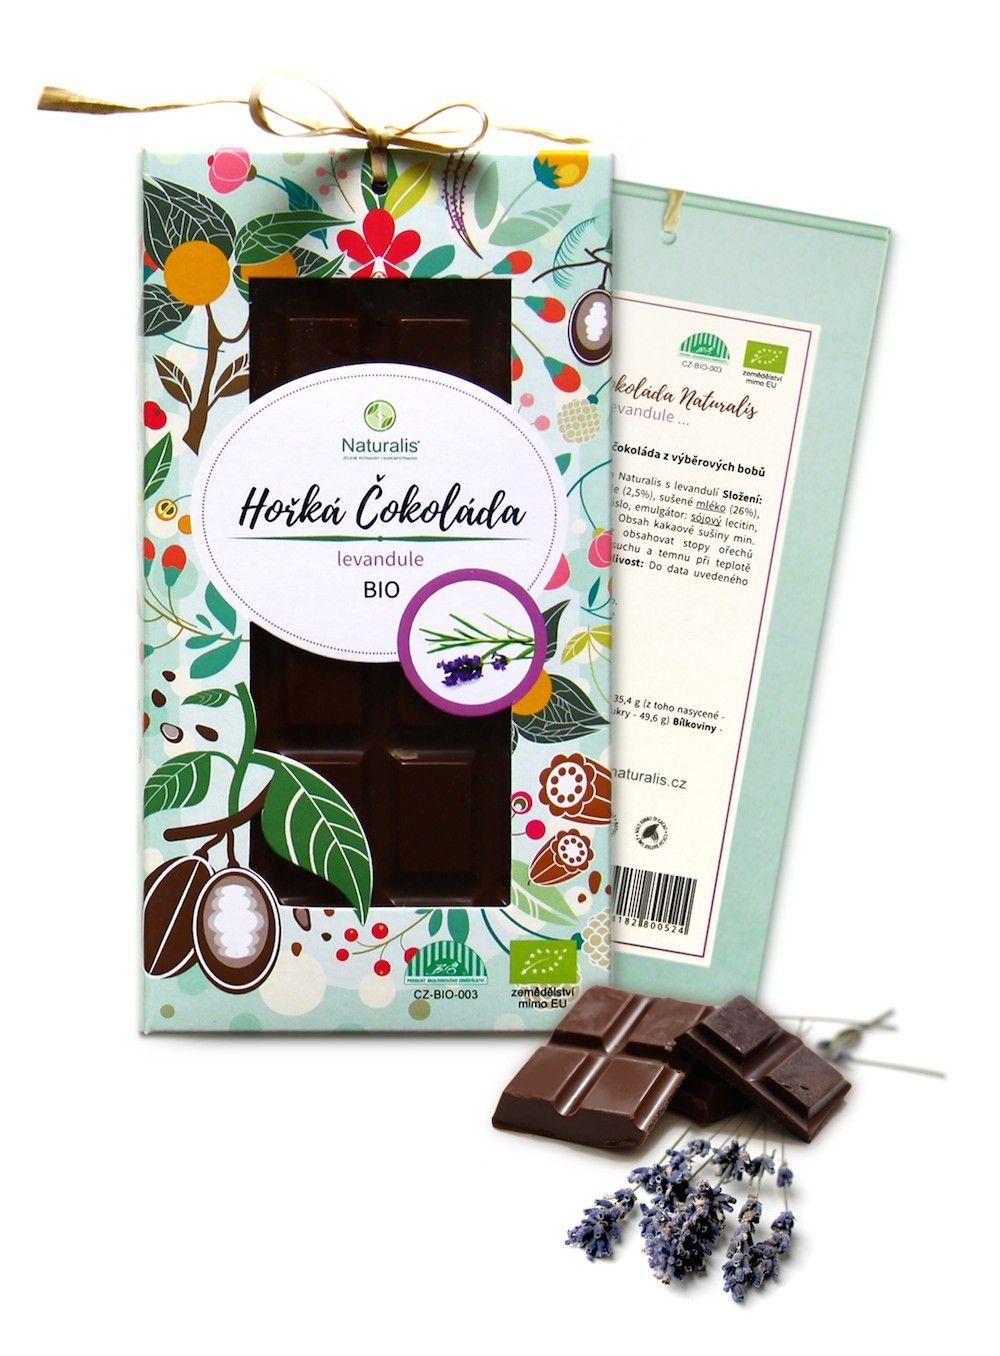 BIO Čokoláda Naturalis s levandulí - 80g